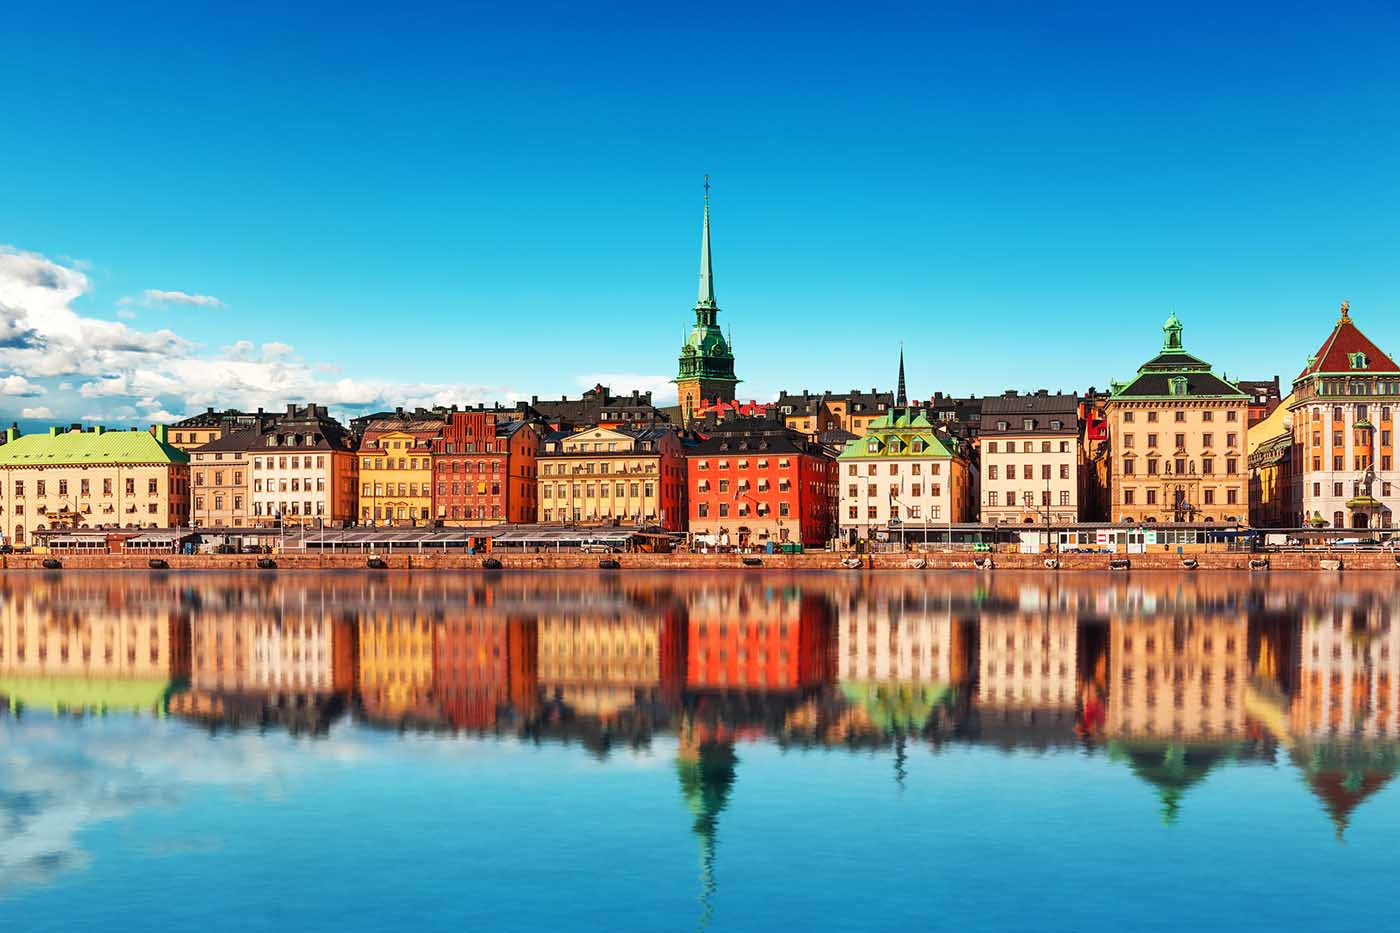 derfor bør du besøke stockholm